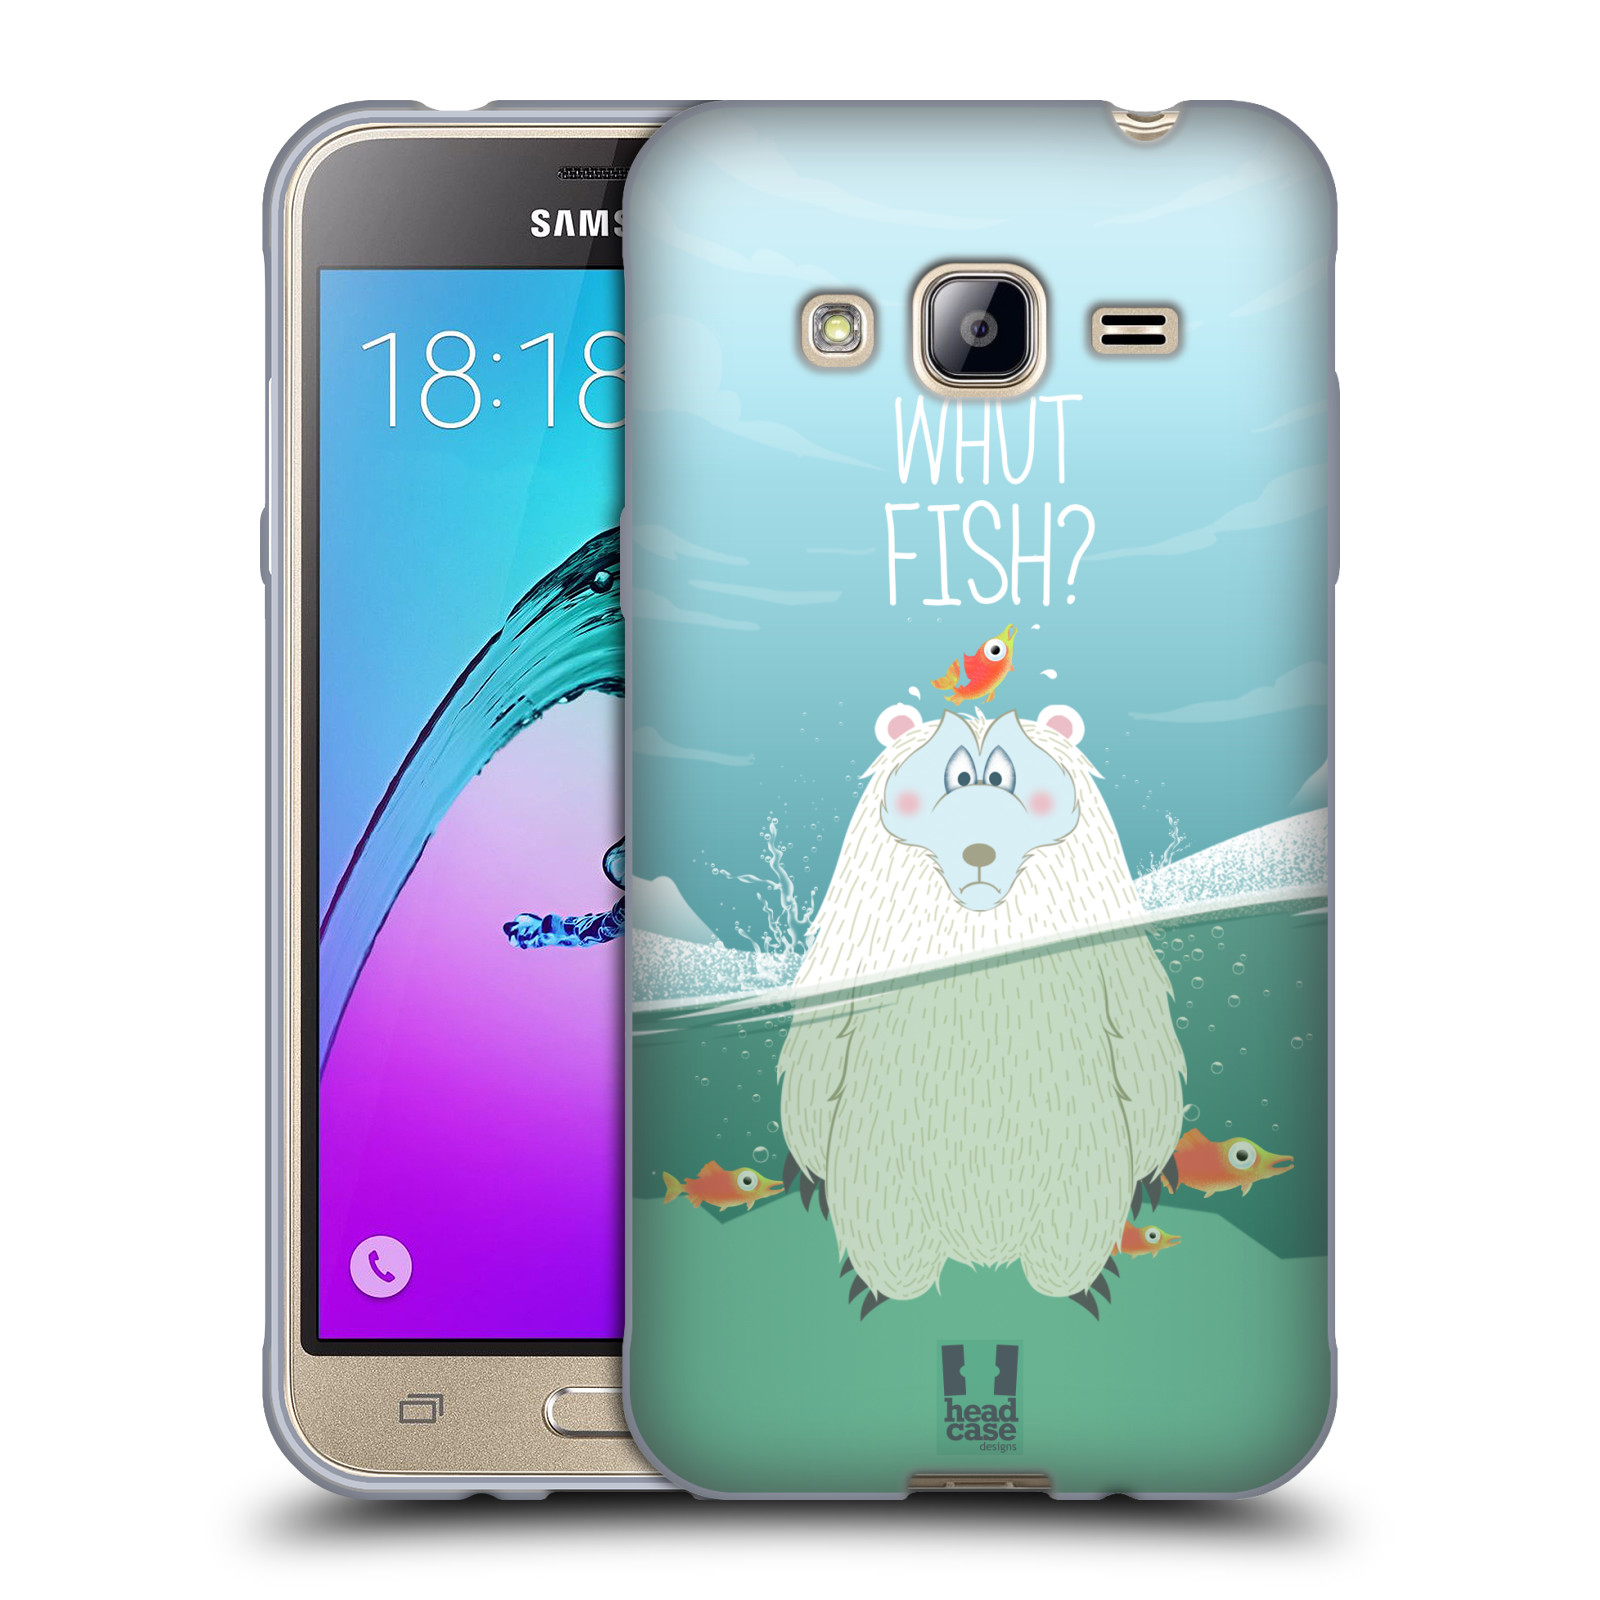 Silikonové pouzdro na mobil Samsung Galaxy J3 (2016) HEAD CASE Medvěd Whut Fish?